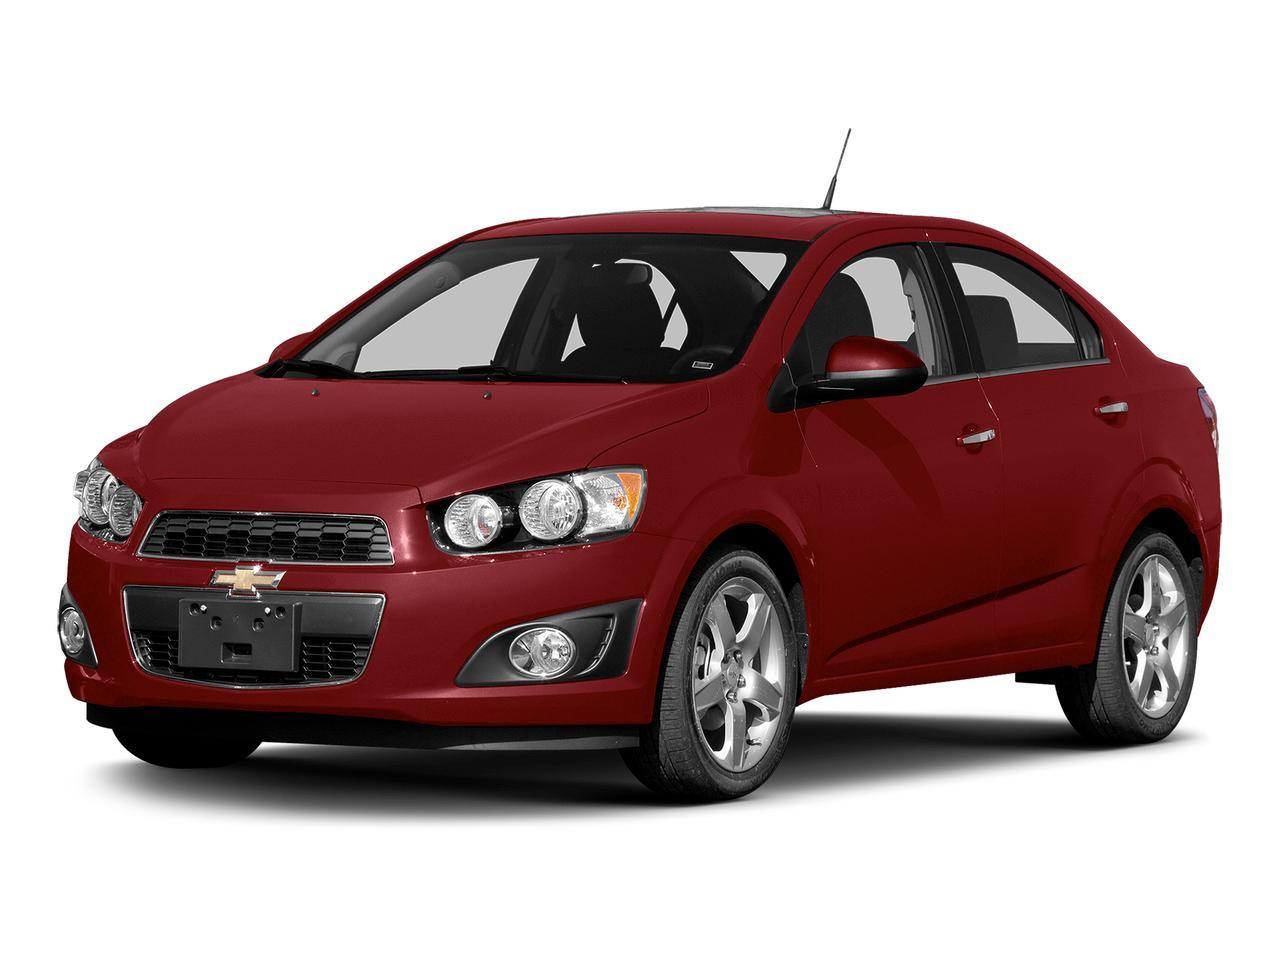 2015 chevrolet sonic sedan lt auto for sale springfield mo 1g1jc5sh9f4214989 infiniti of springfield